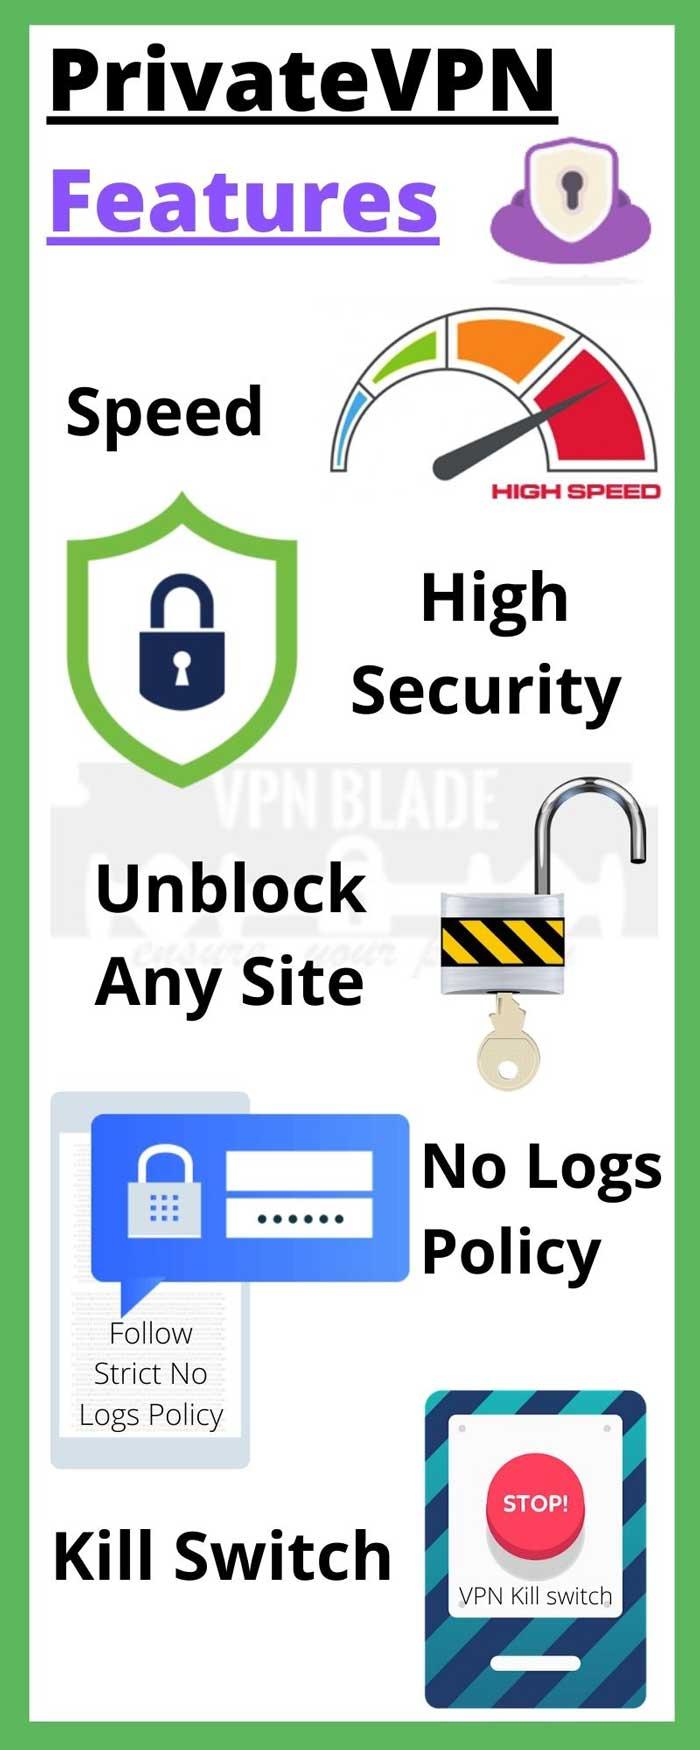 PrivateVPN Features Info